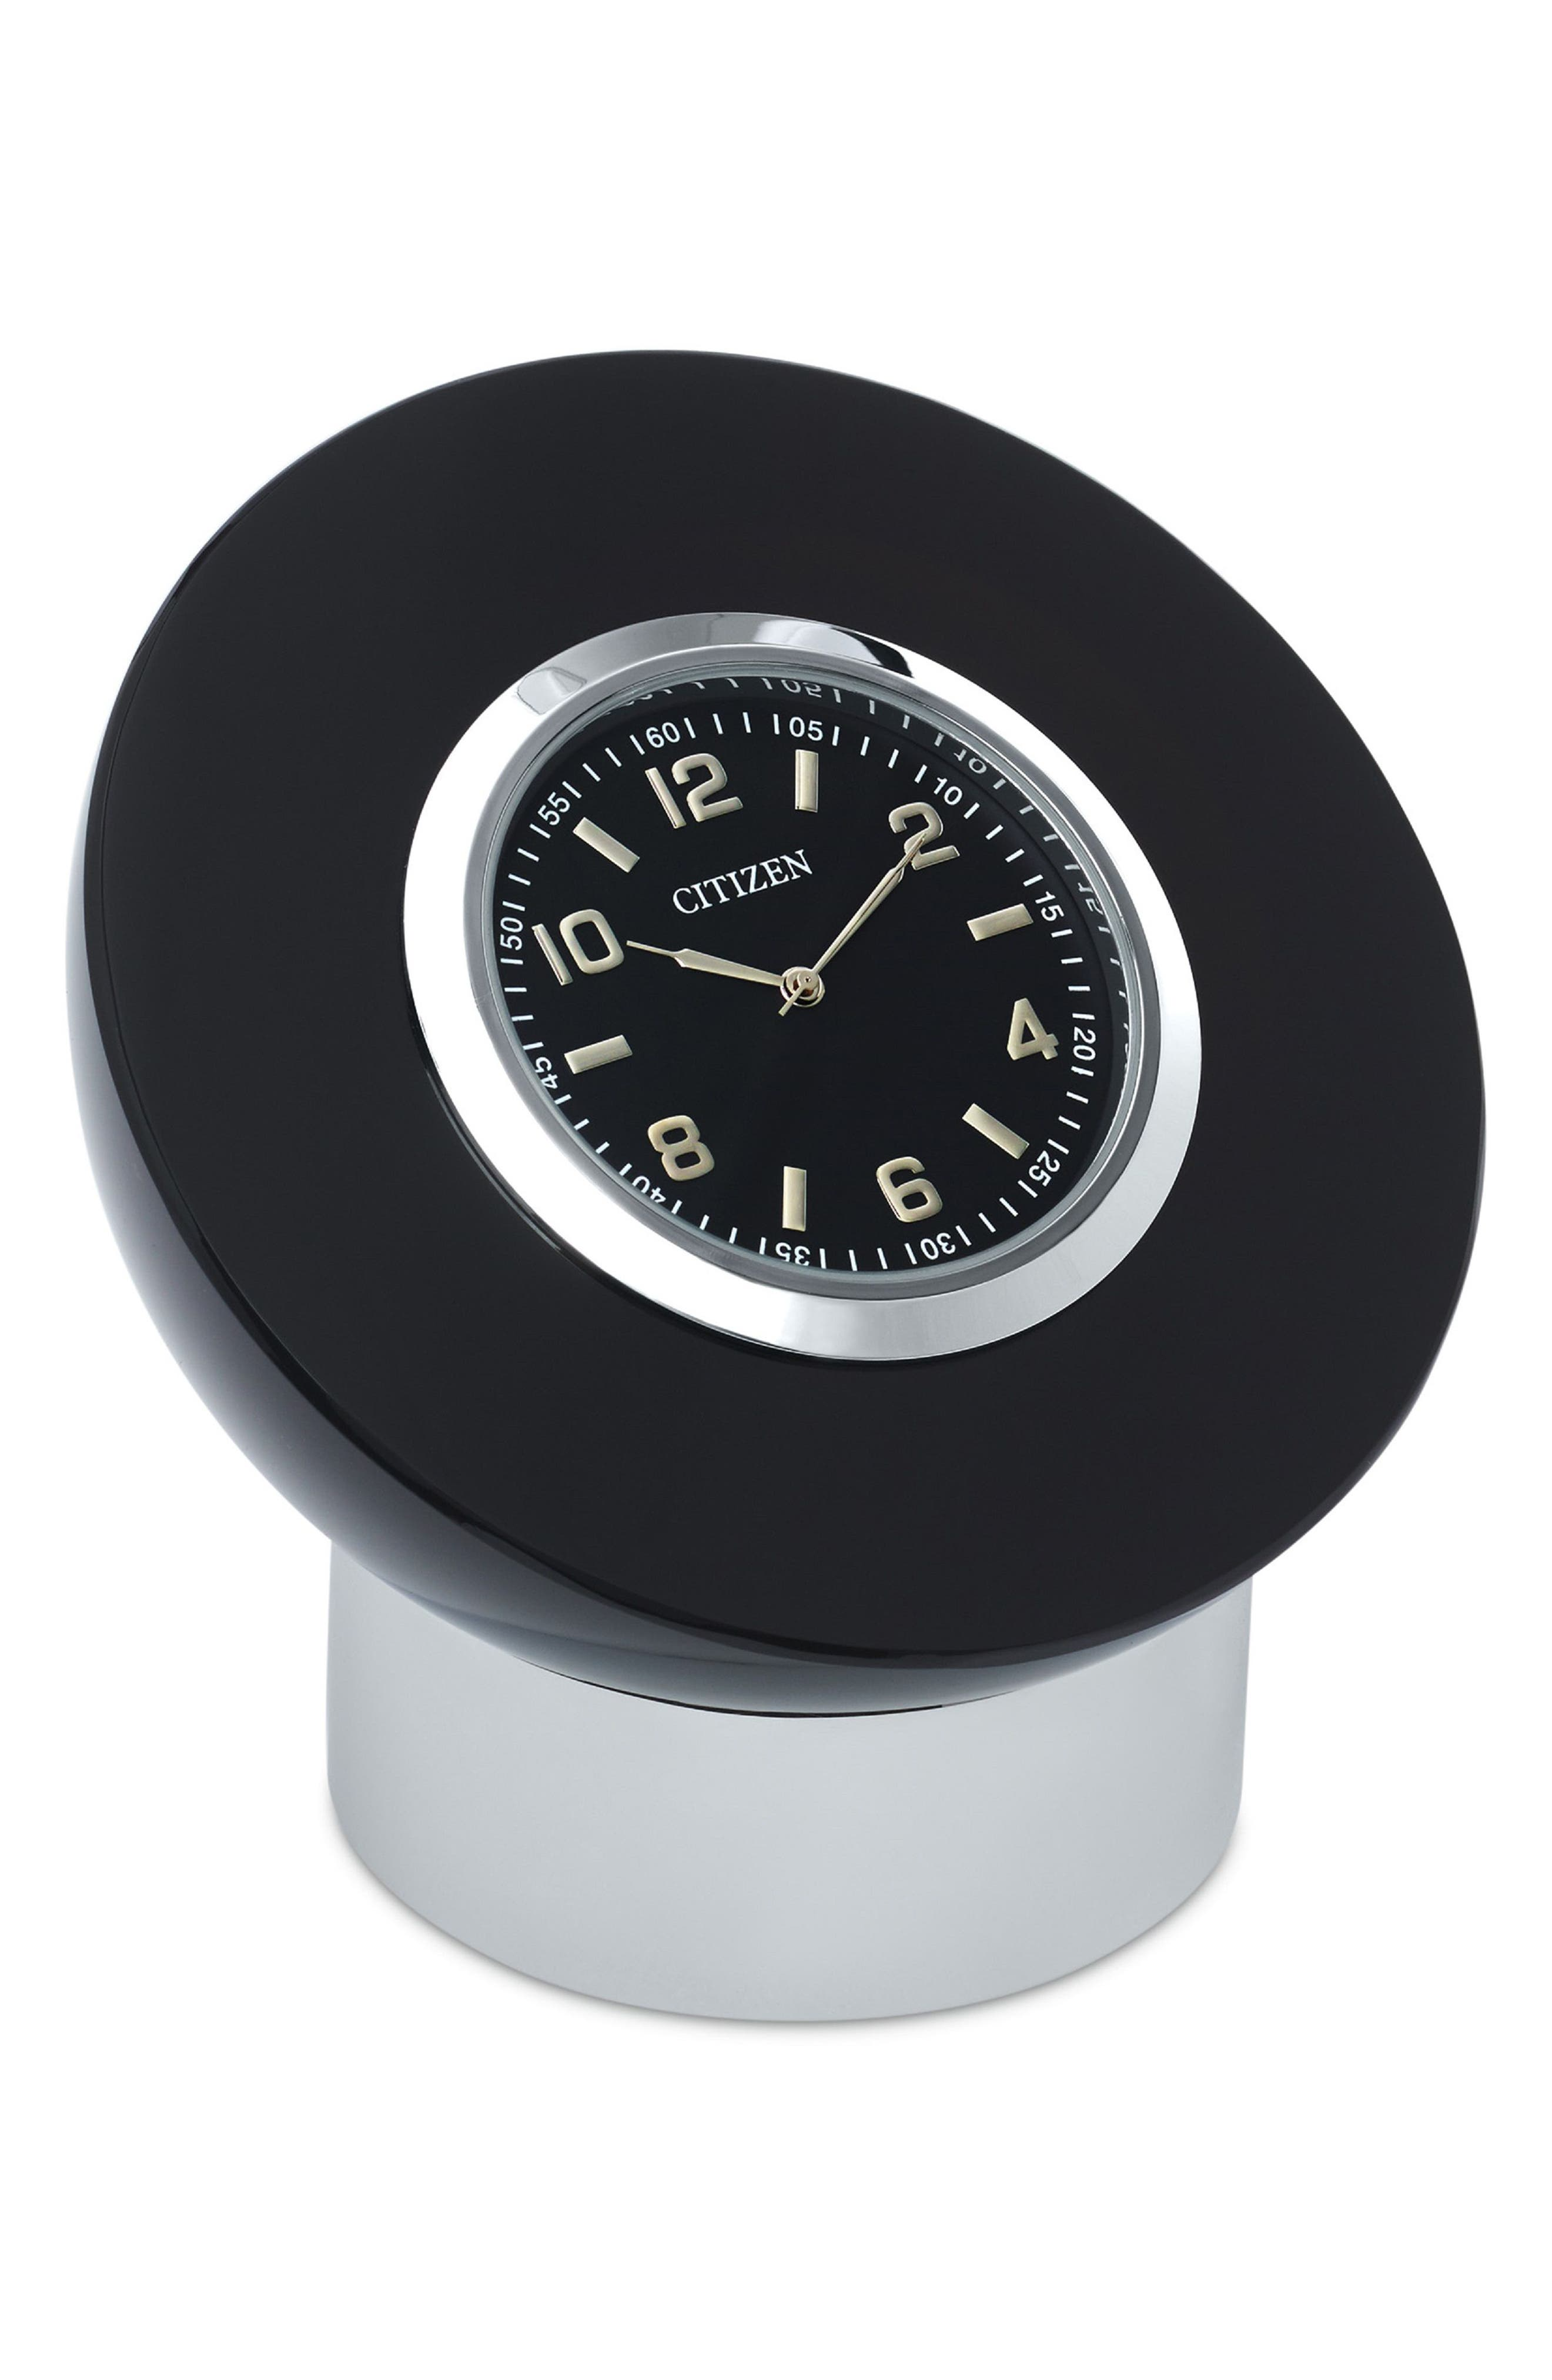 Decorative Accent Desk Clock,                             Main thumbnail 1, color,                             Black